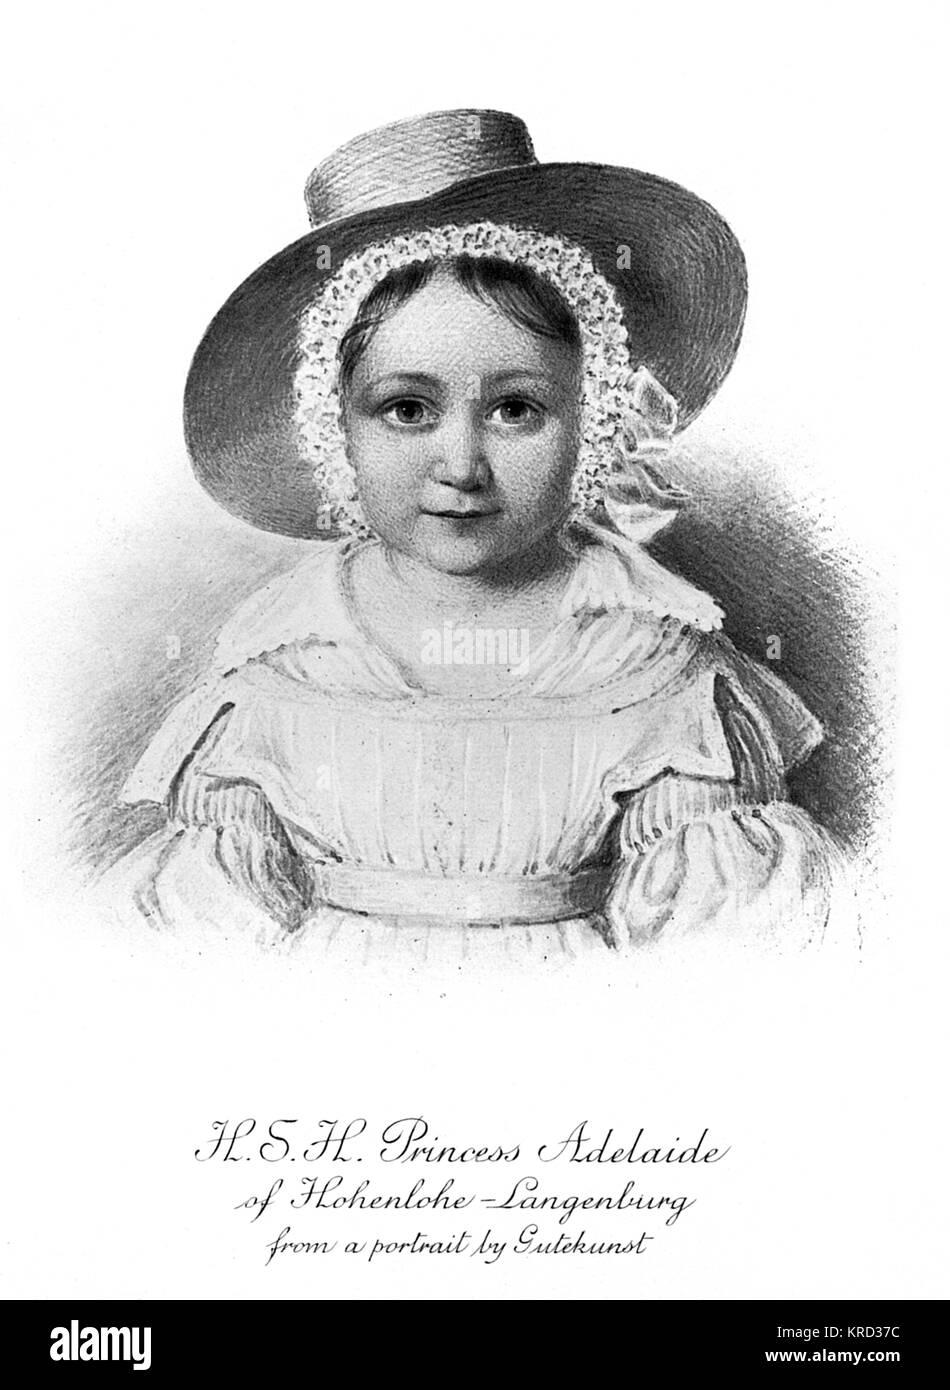 Princess Adelheid (Adelaide) of Hohenlohe-Langenburg (1835-1900), niece of Queen Victoria being the daughter of - Stock Image